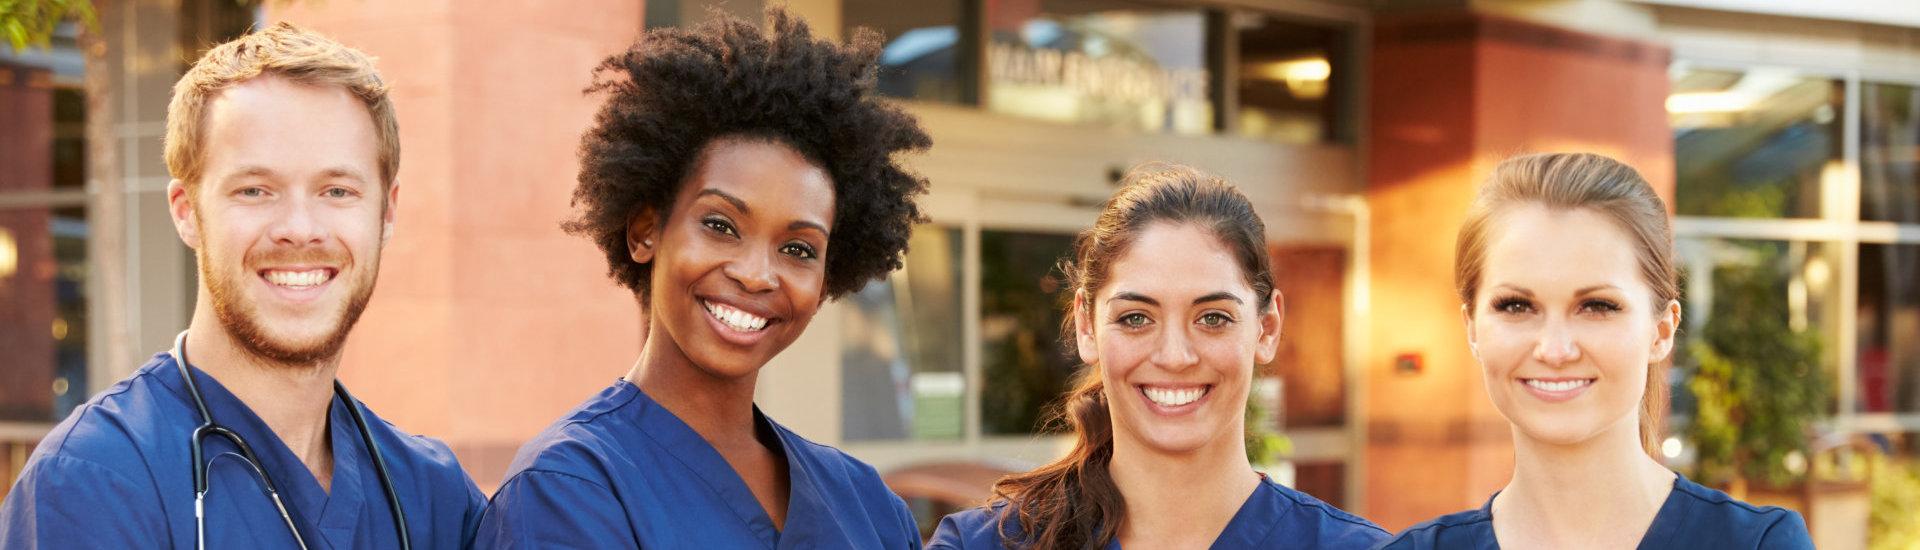 group of medical staffs smiling